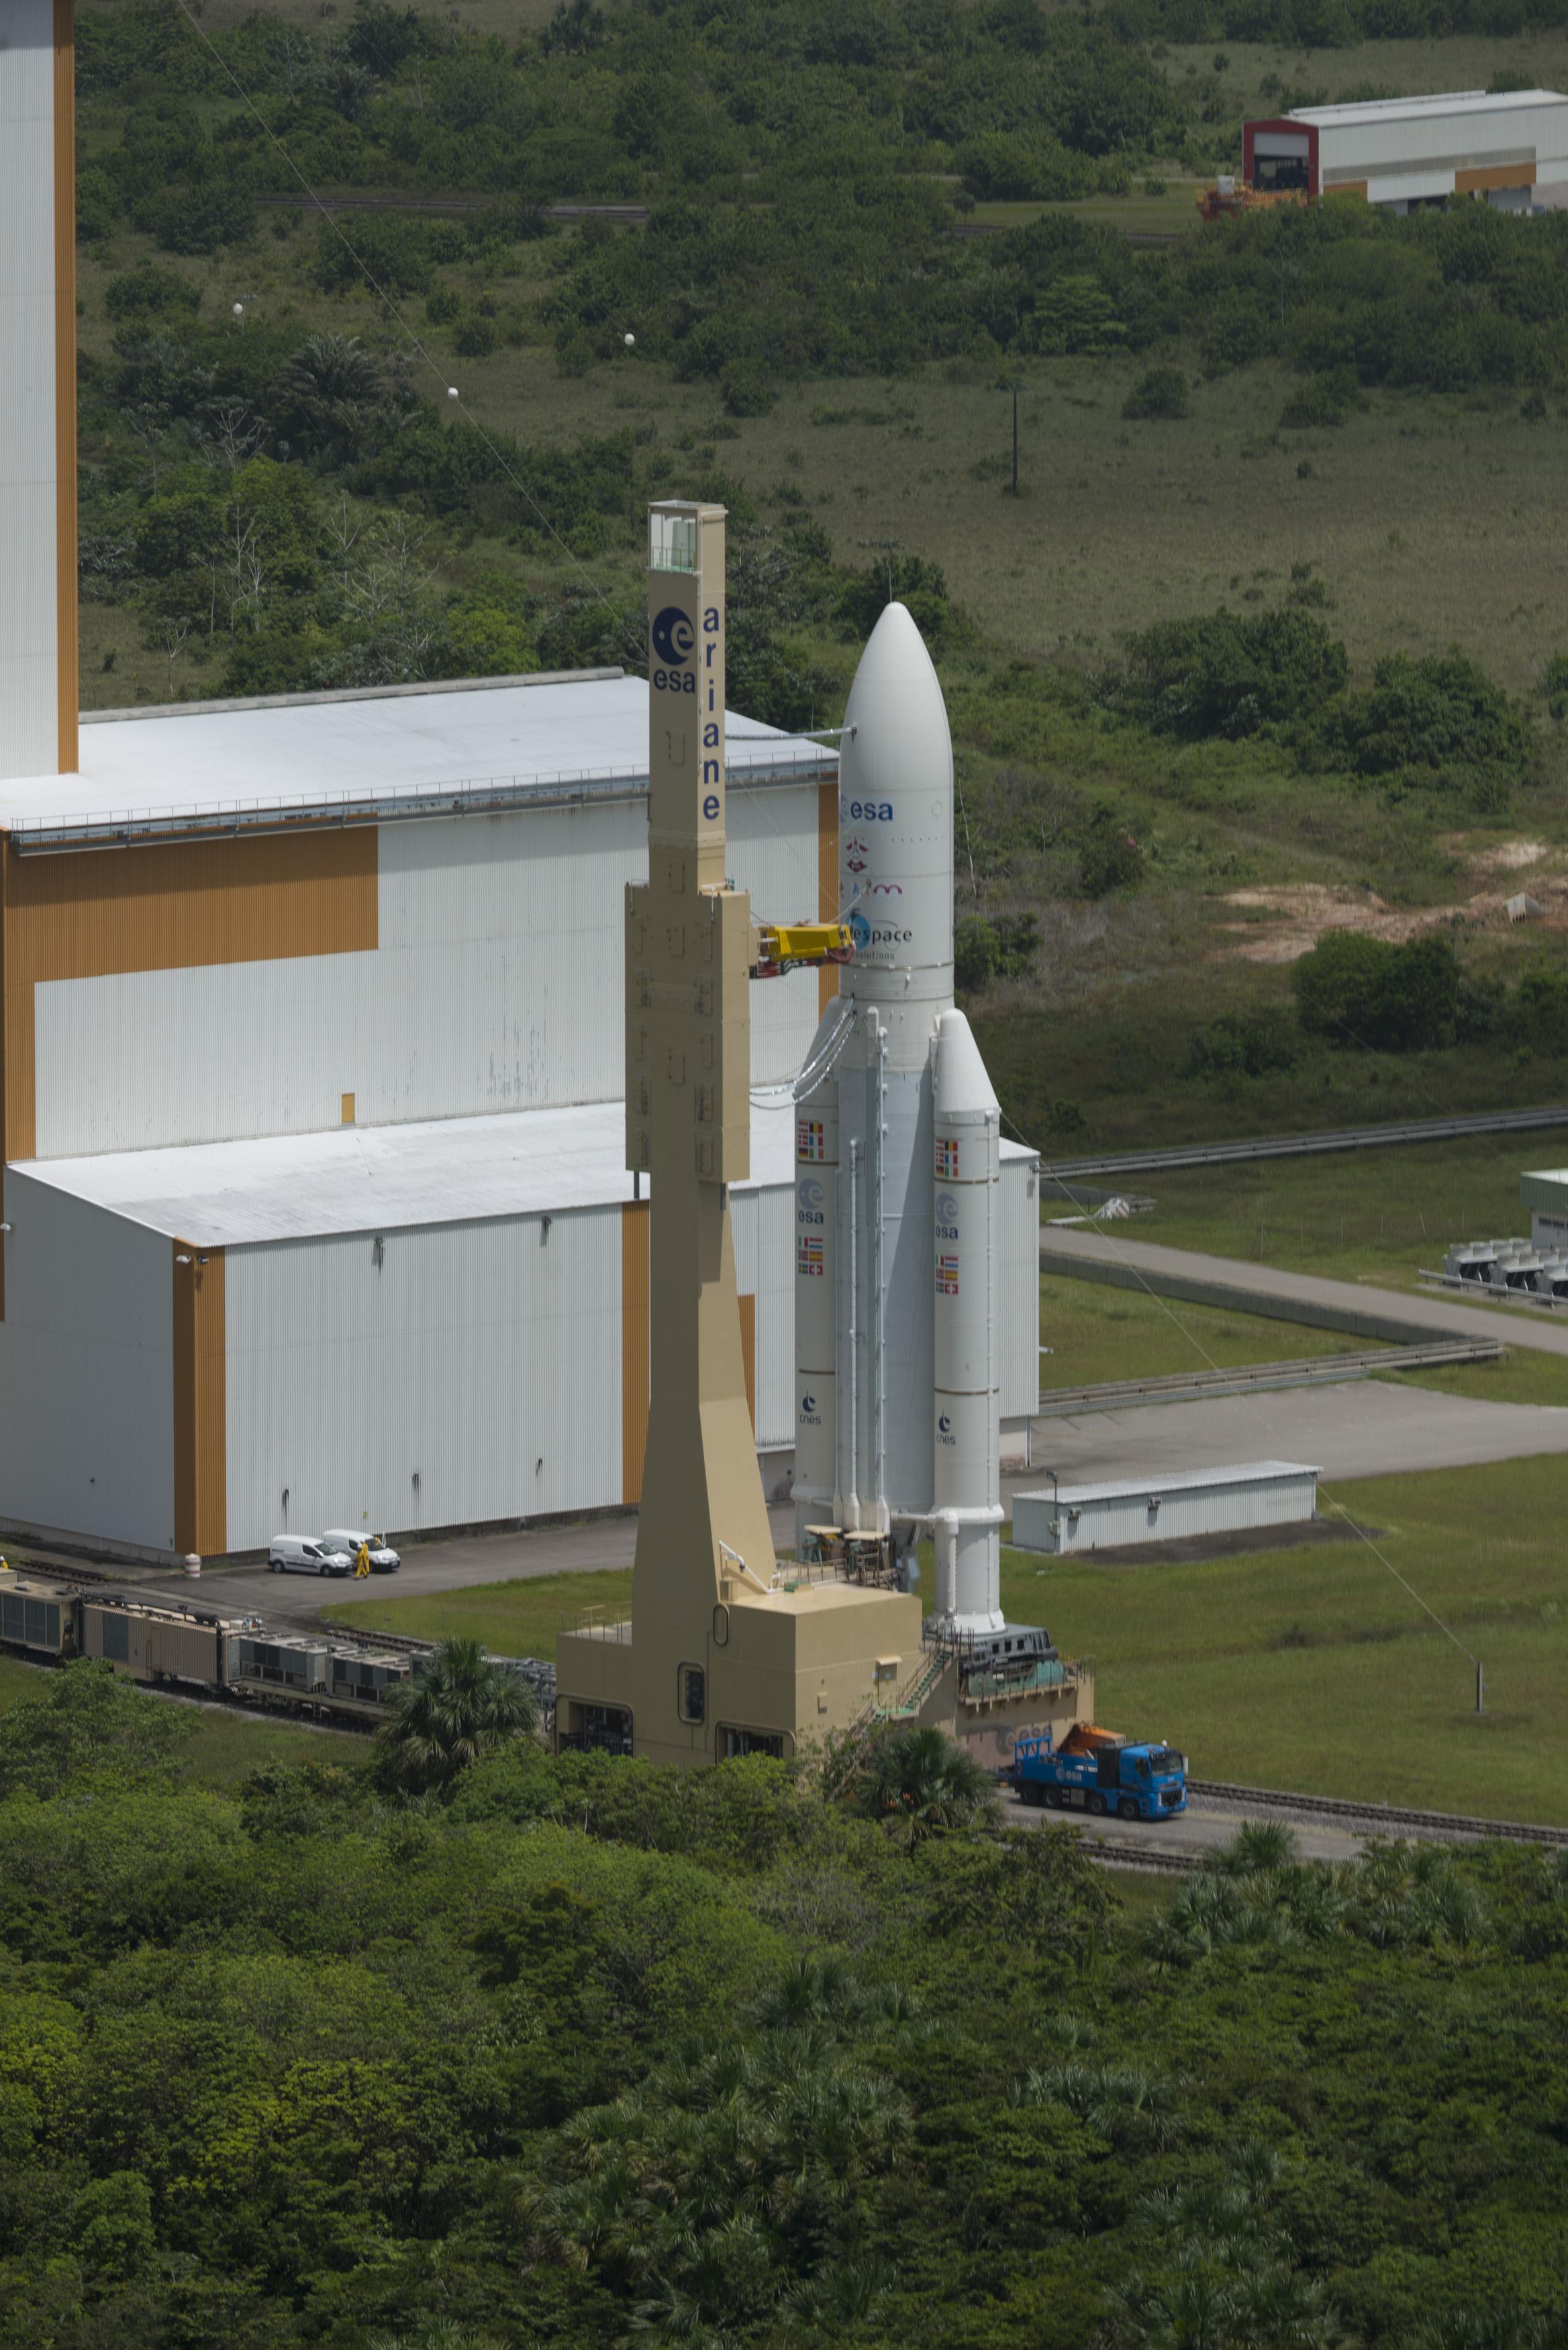 Ariane 5 Transfer